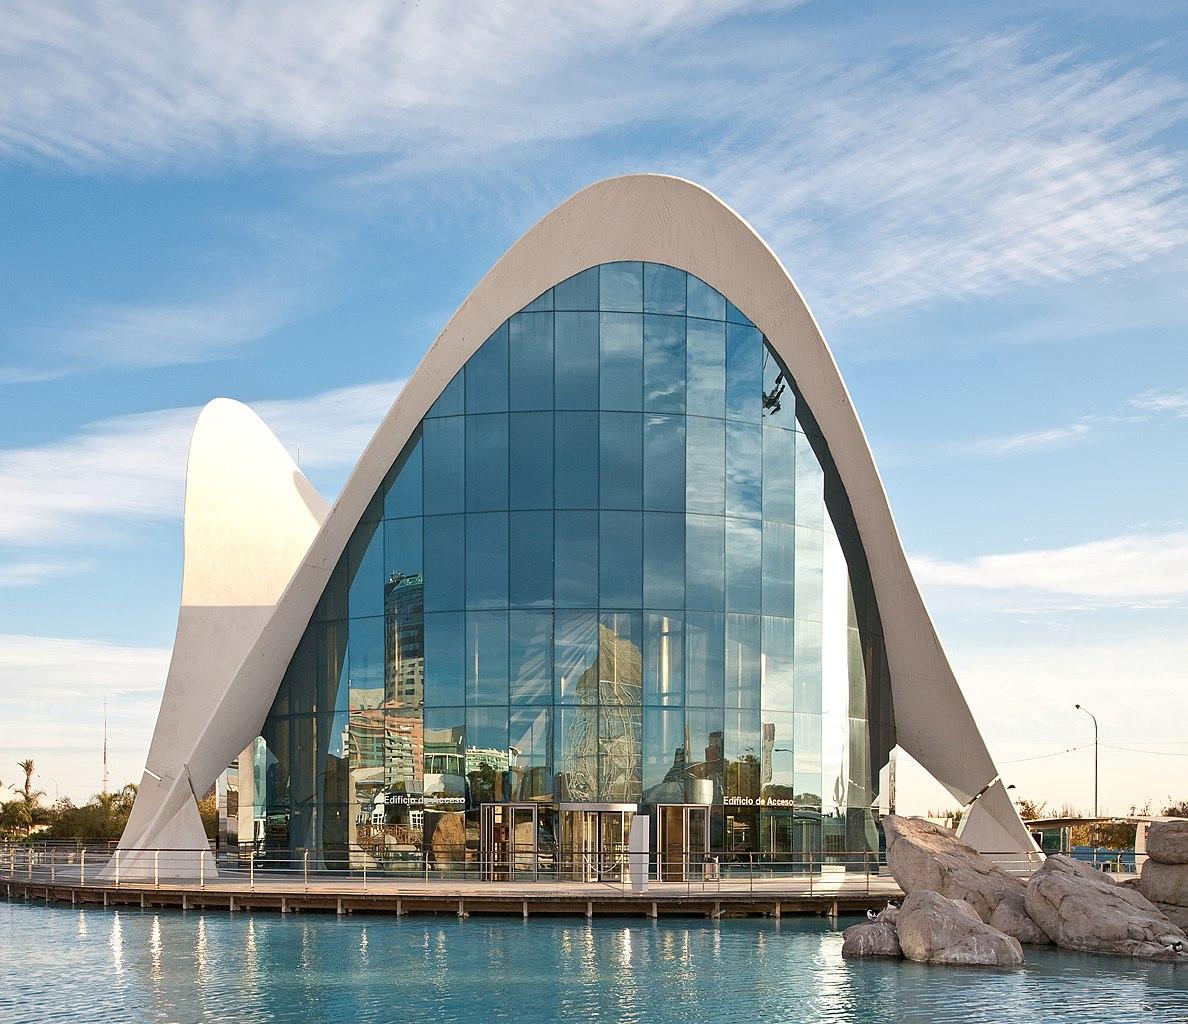 File:L'Oceanografic, Valencia, Spain 2 - Jan 07-cropped ...